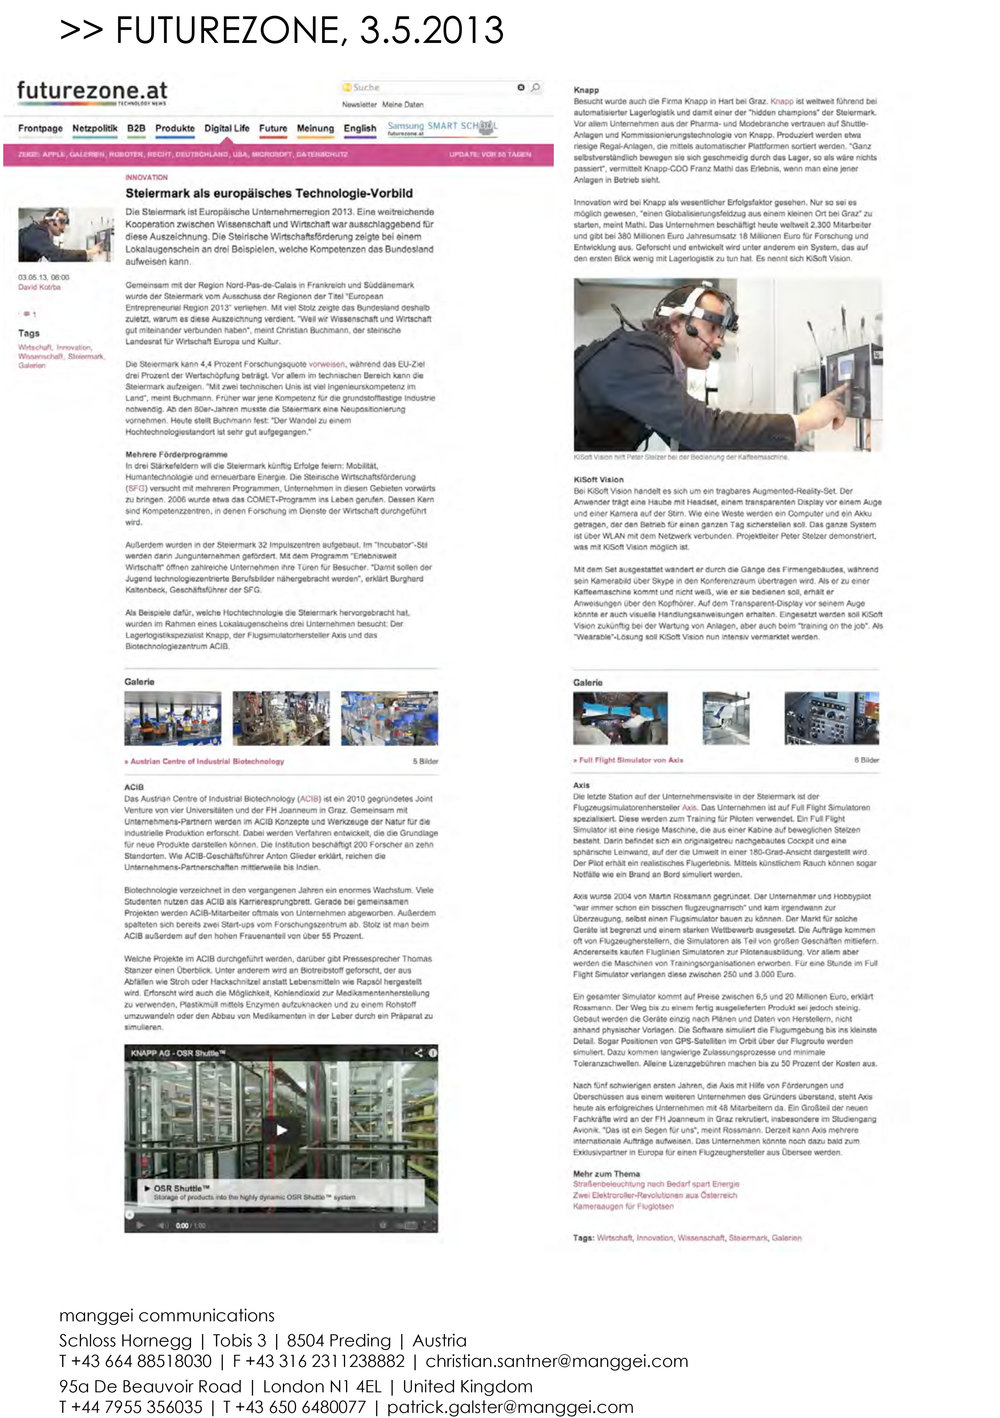 manggei-communications---presse-clippings-komplett---journalistenreise-2013_-13.jpg